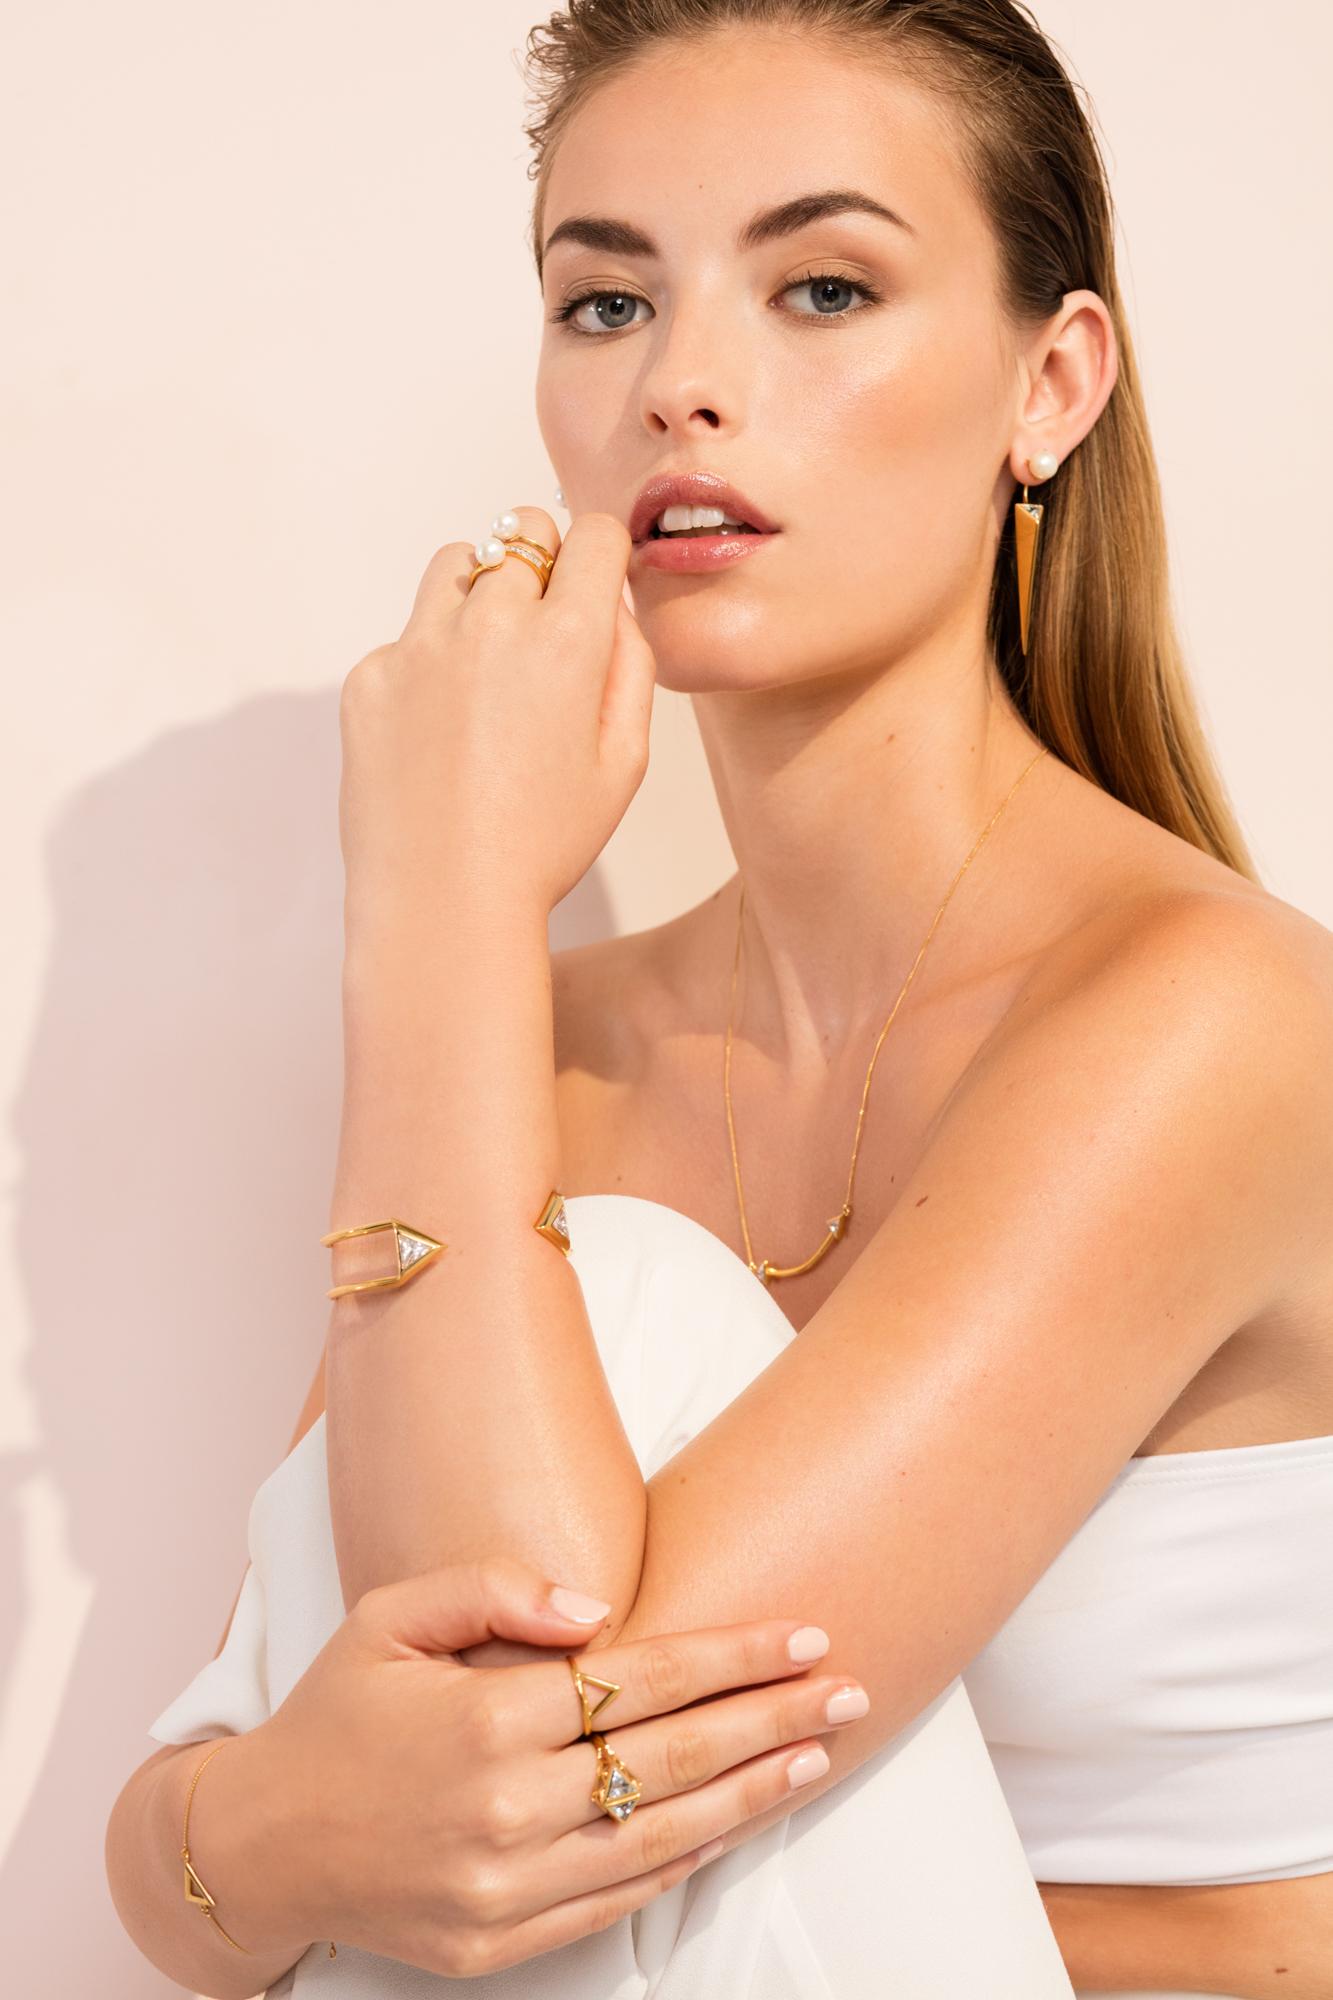 shoot-studio-london-photography-jewellery-kova-model-campaign-editorial